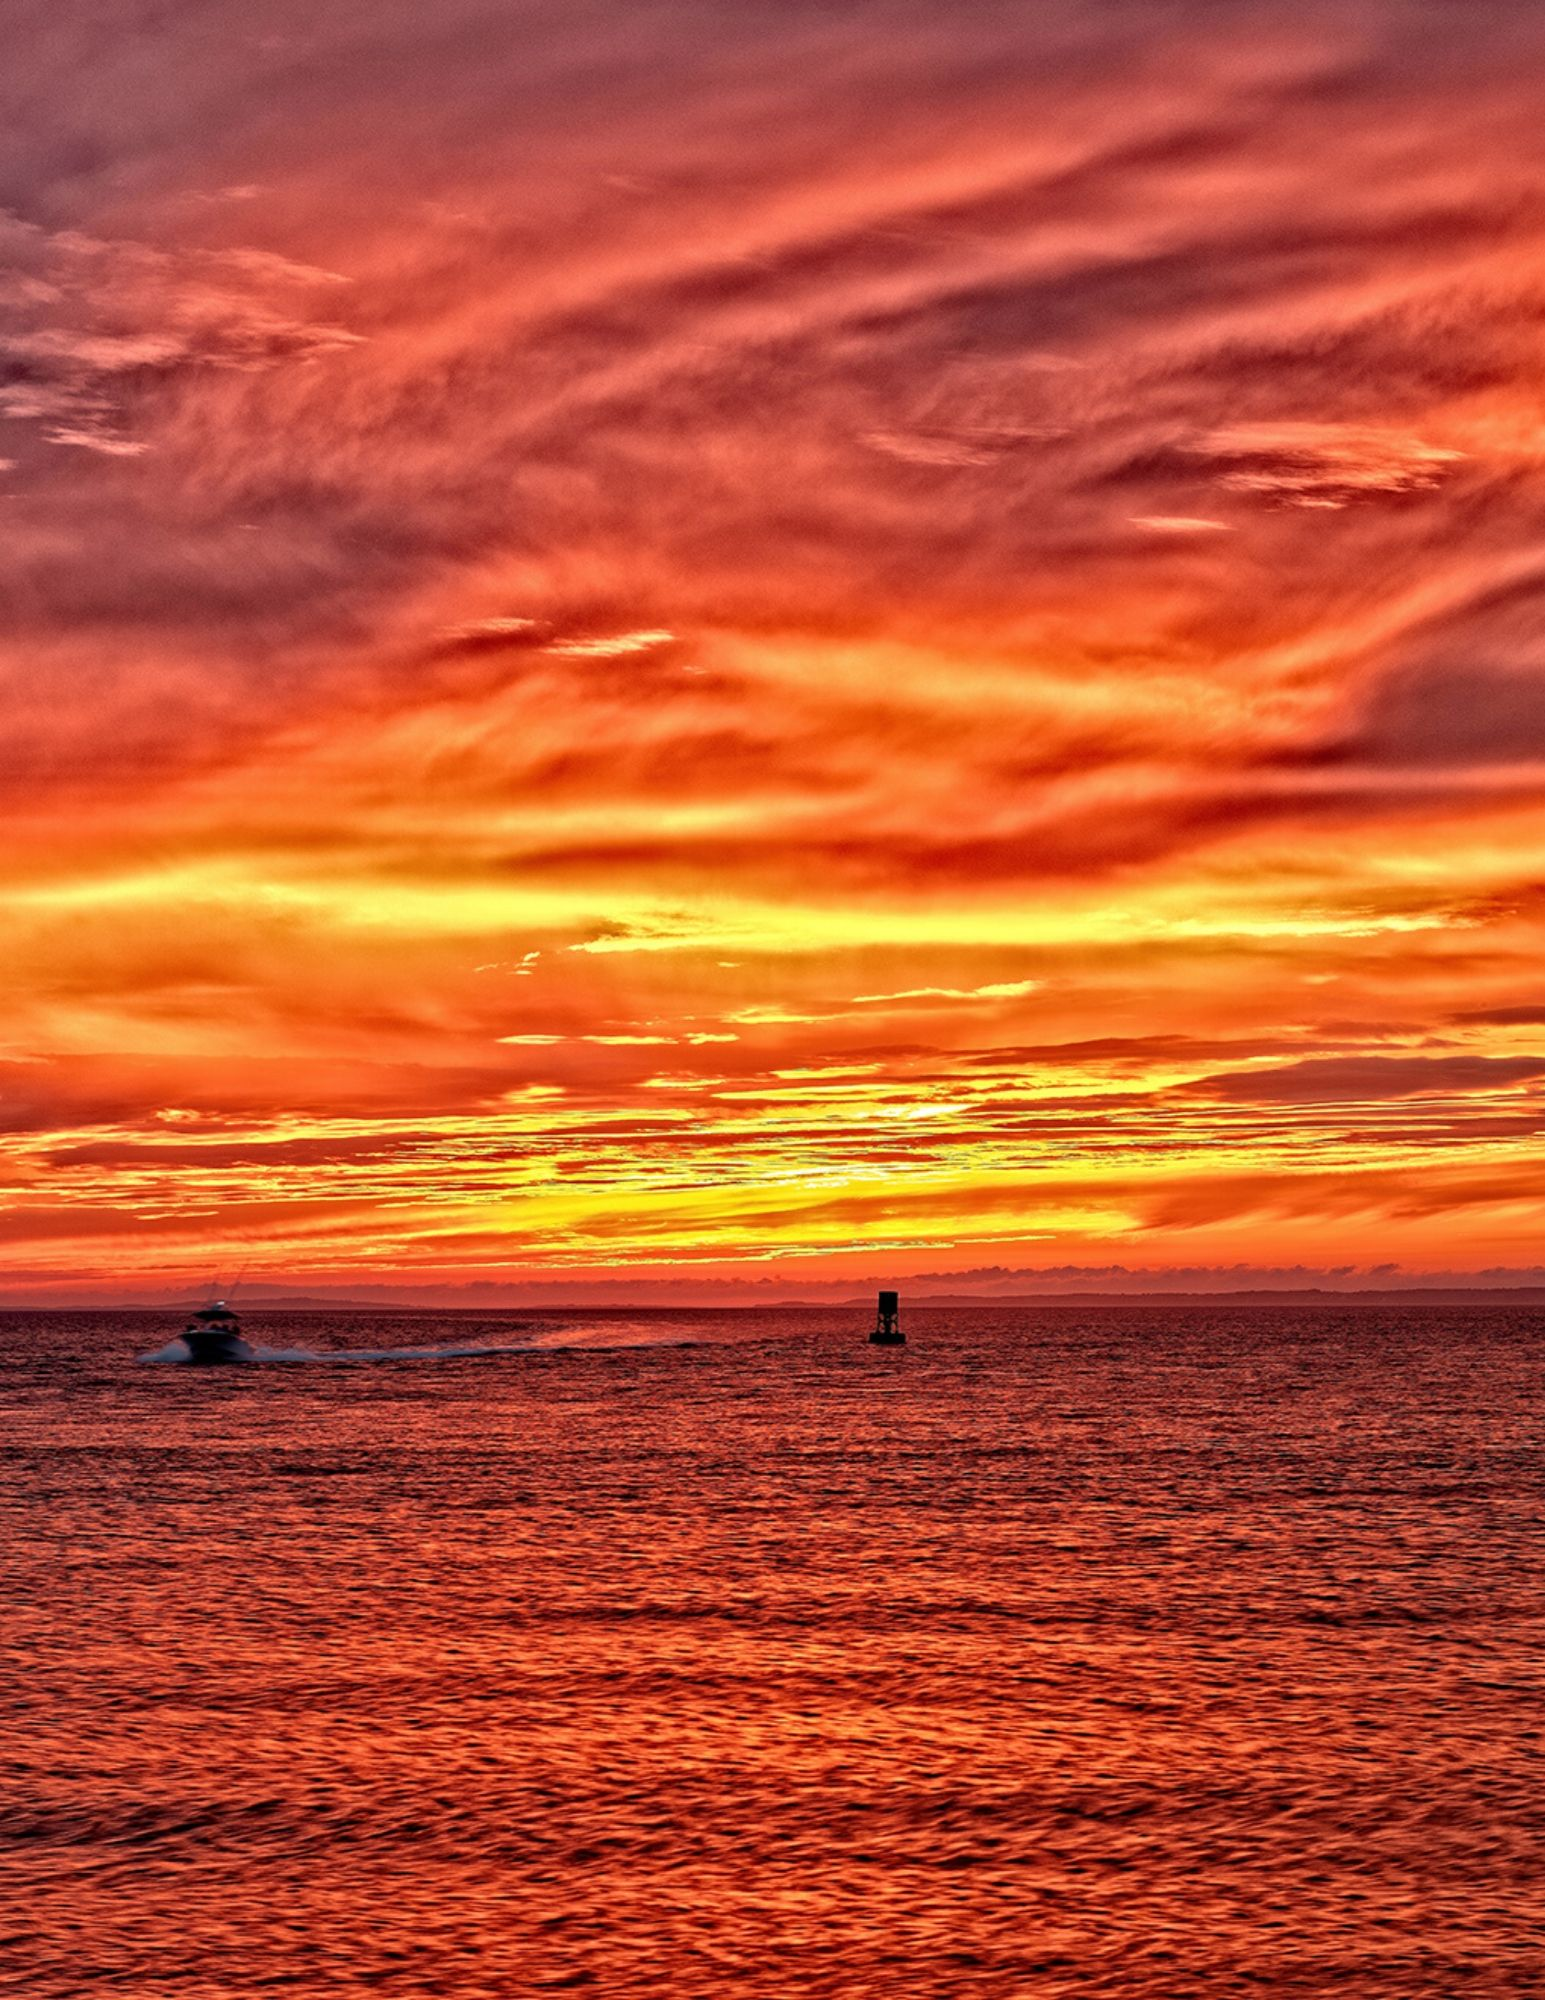 John Montes Jr Photography Best Places to Photograph Sunrise and Sunset on Marthas Vineyard-Best Places to Photograph Sunrise and Sunset on Marthas Vineyard-21